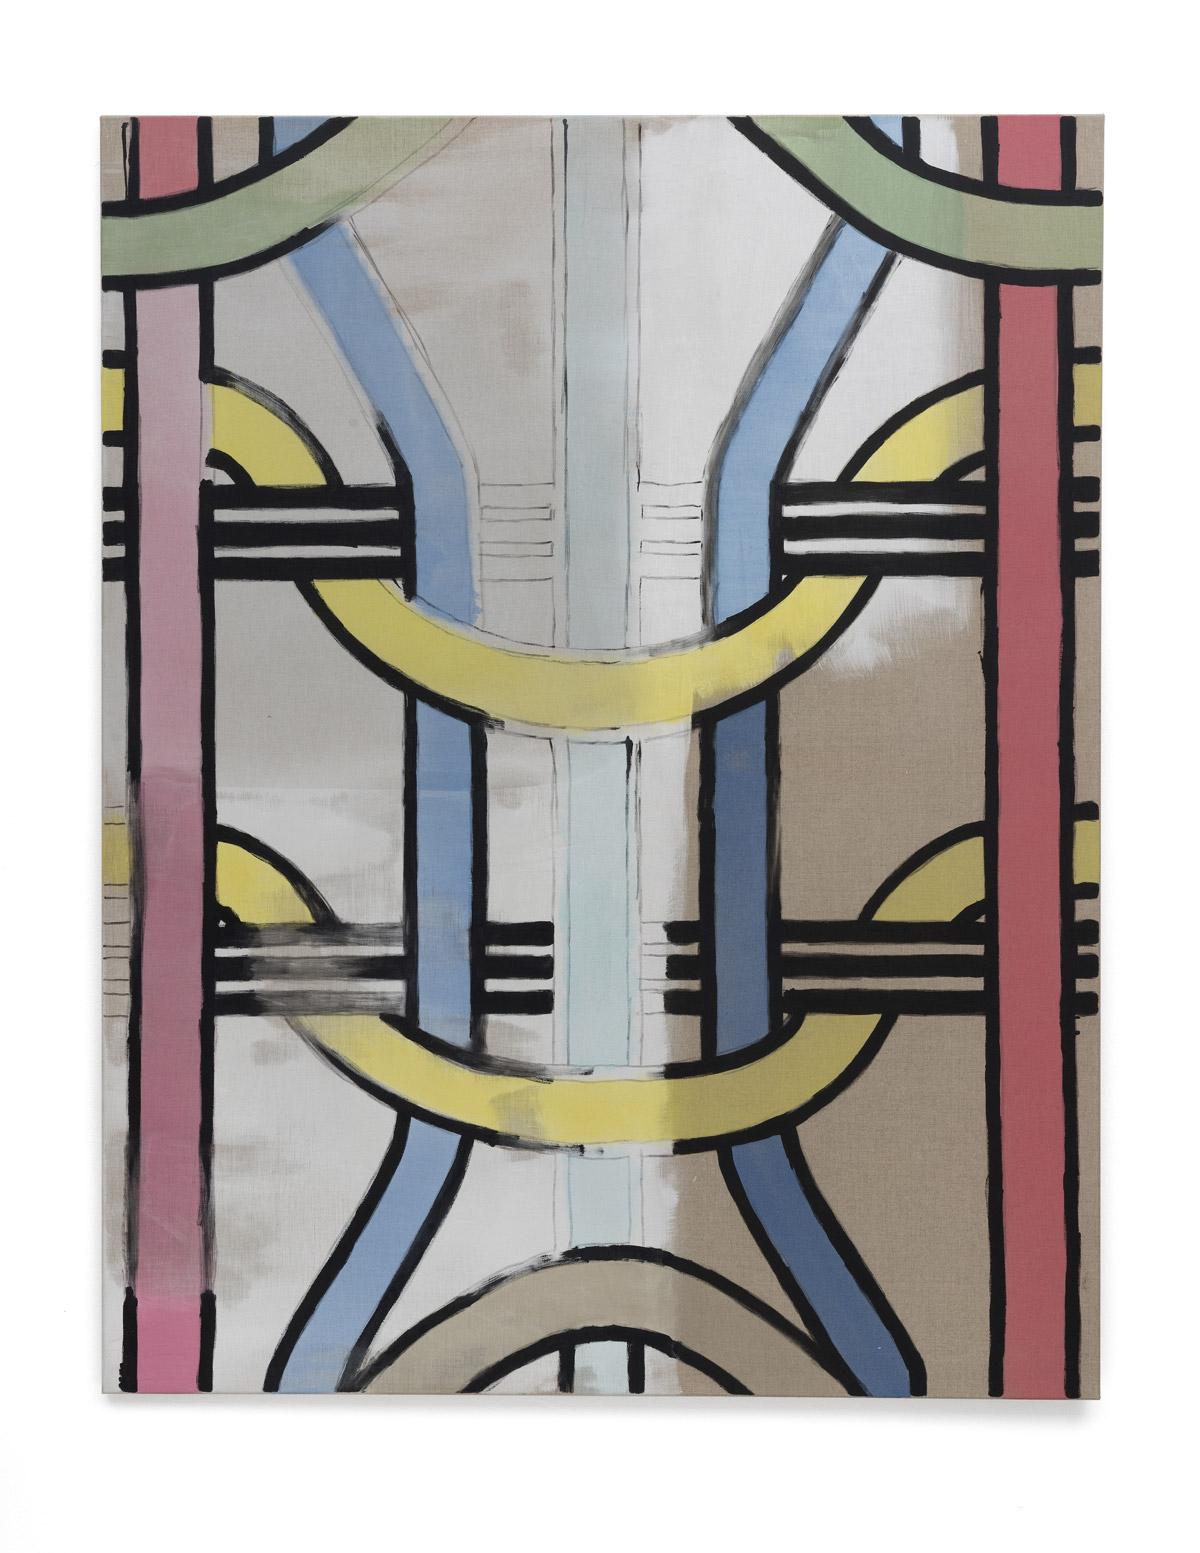 Martin Feldbauer Underdog IV 2018 acrylic on linen 185x145 cm